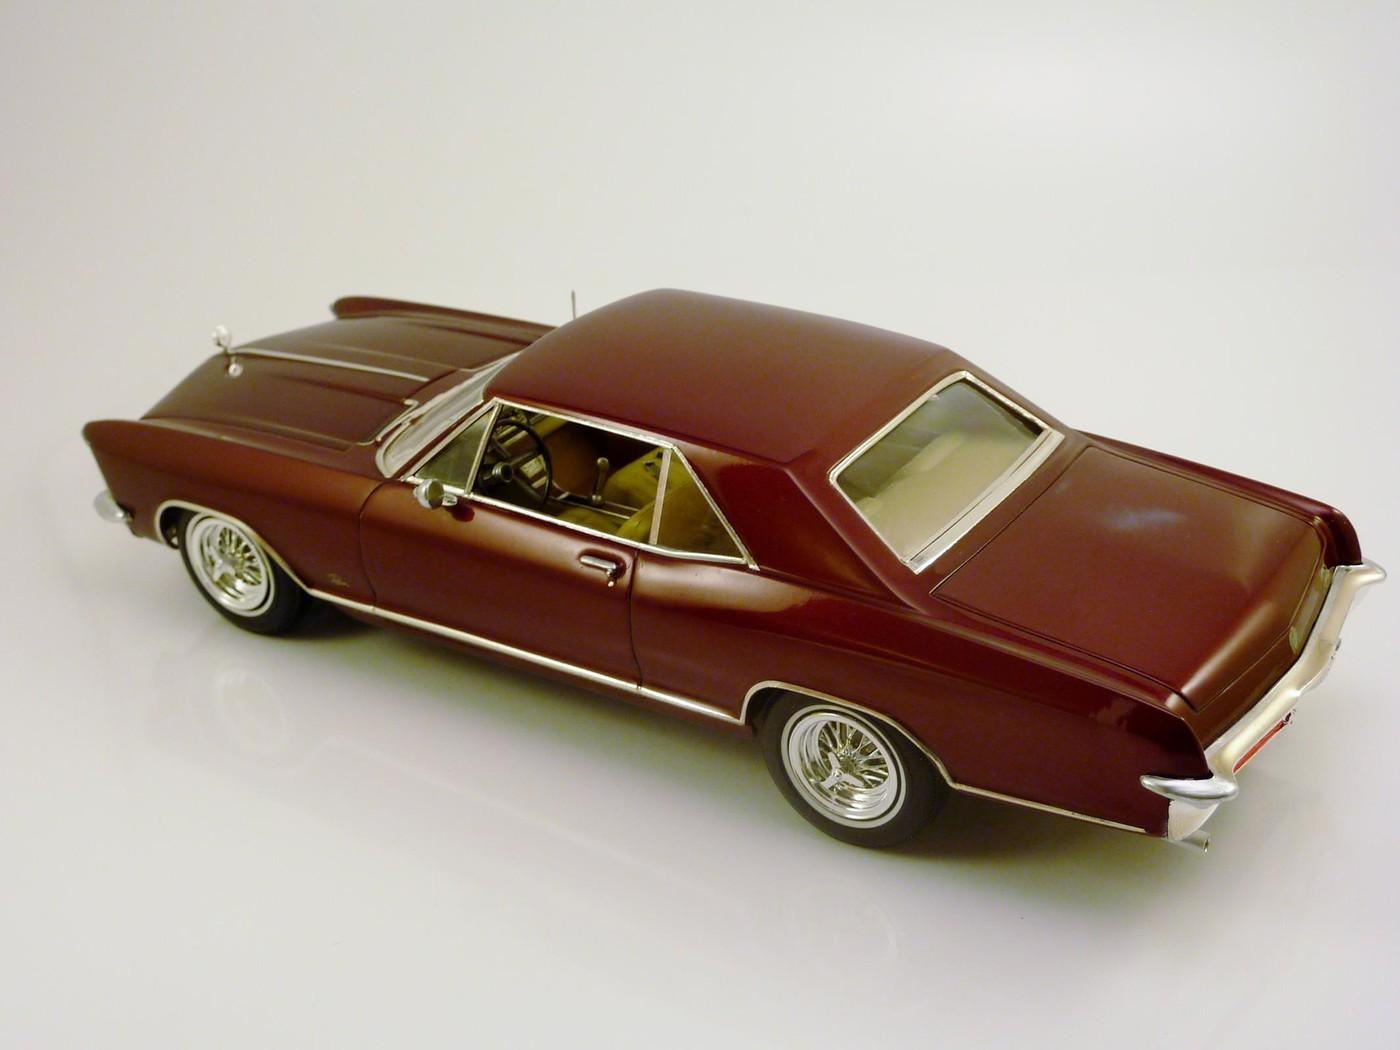 Buick Riviera 65 terminée - Page 3 Photo13-vi